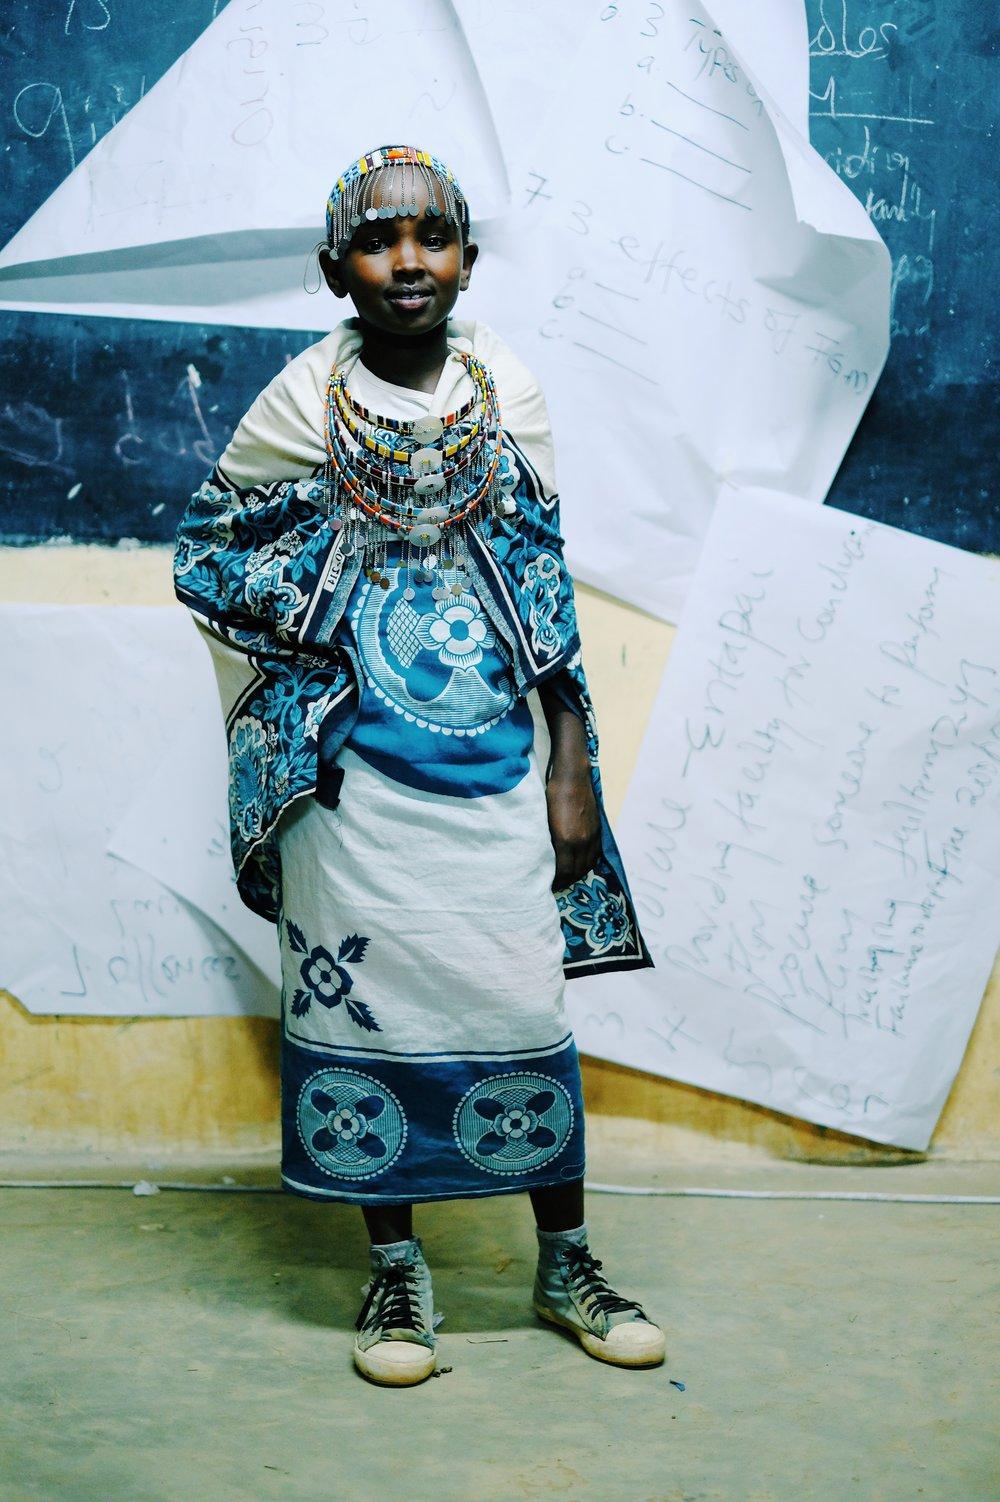 Maasai Olentoko 'End FGM' Beauty Pageant 3 by Joost Bastmeijer.jpeg